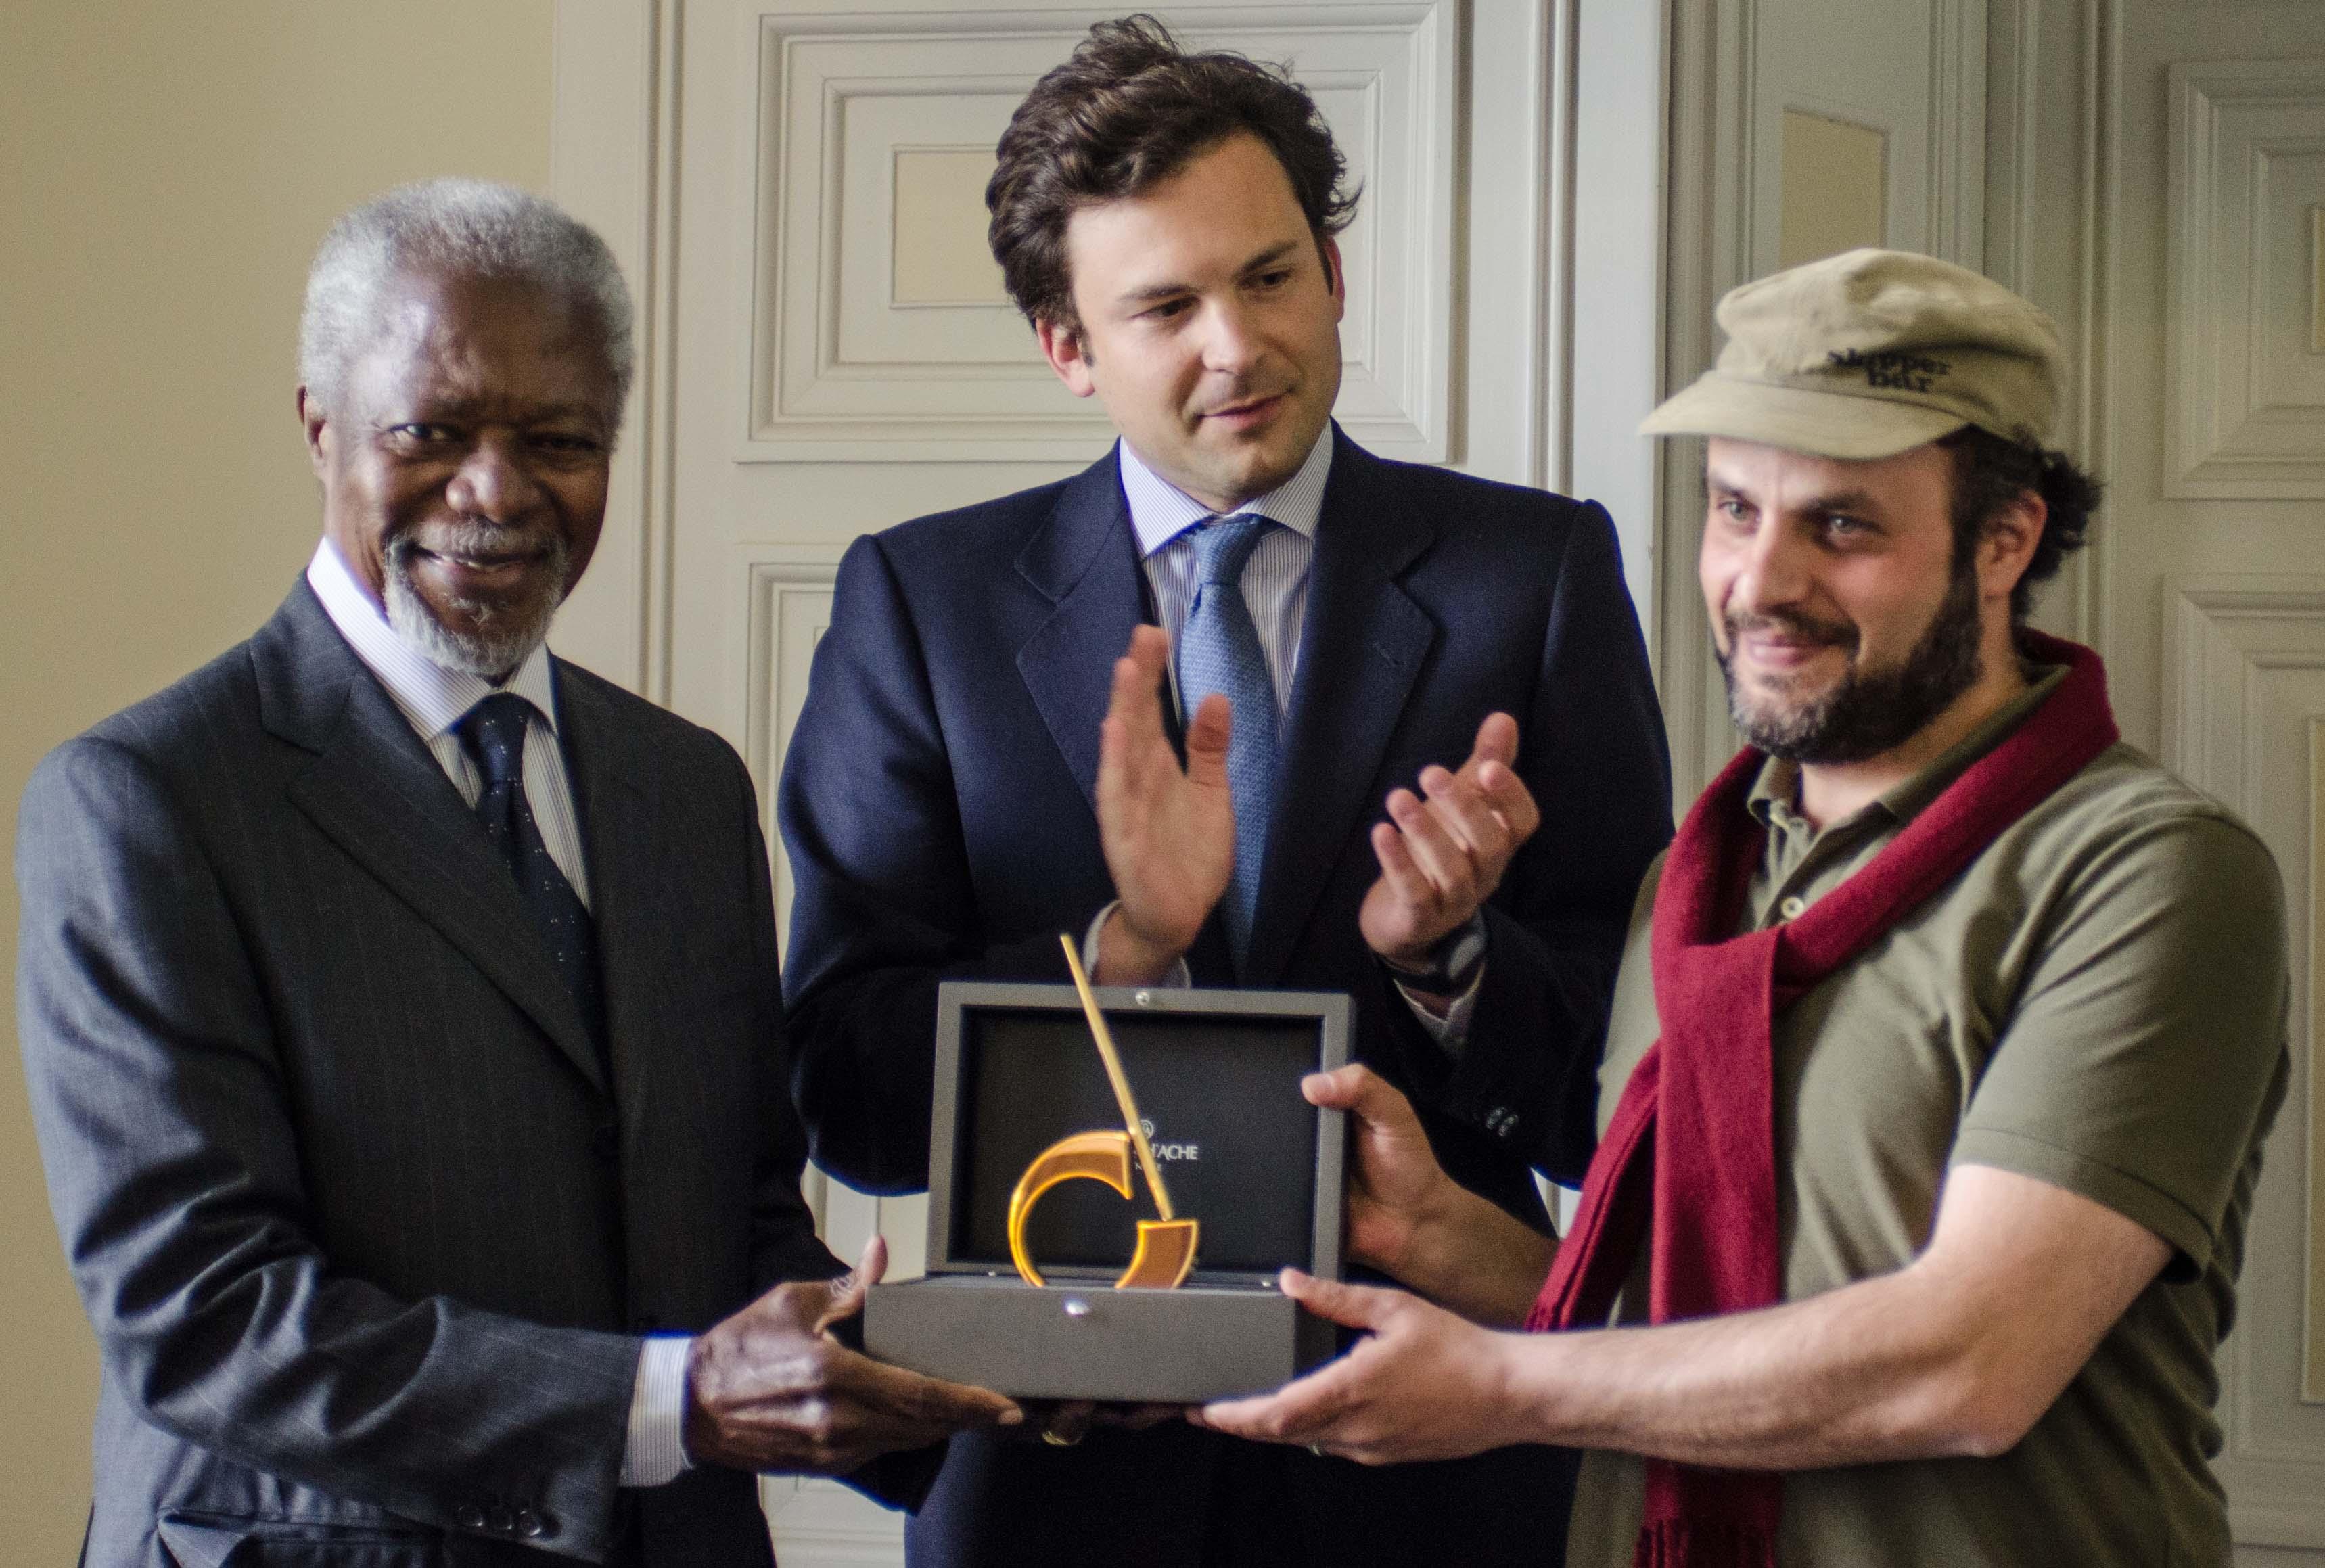 Kofi Annan and Hani Abbas, winner of the International Press Cartoon Award 2014